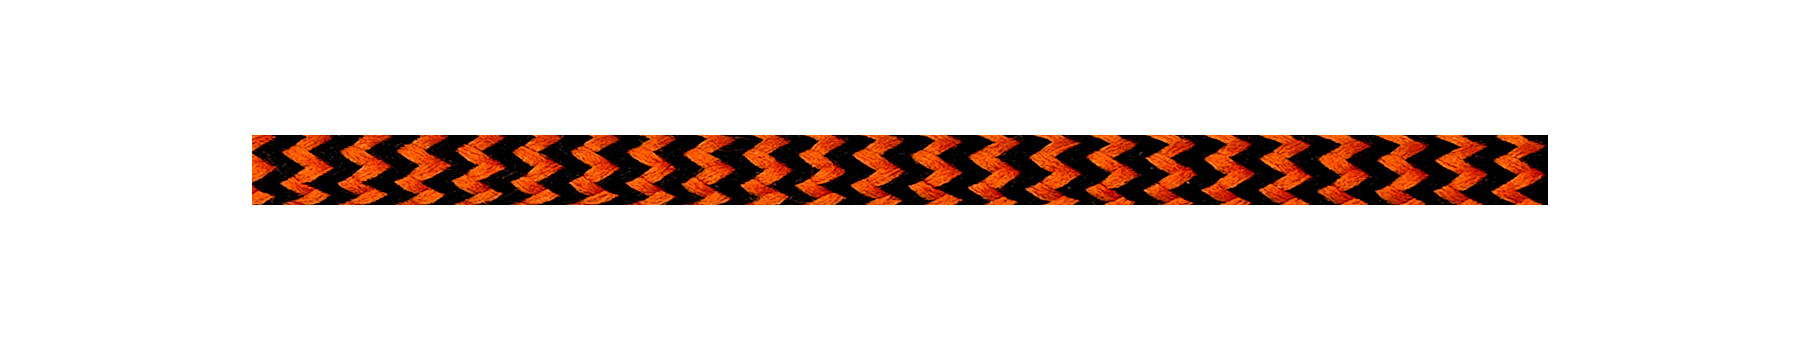 Textilkabel Orange-Schwarz Zick Zack